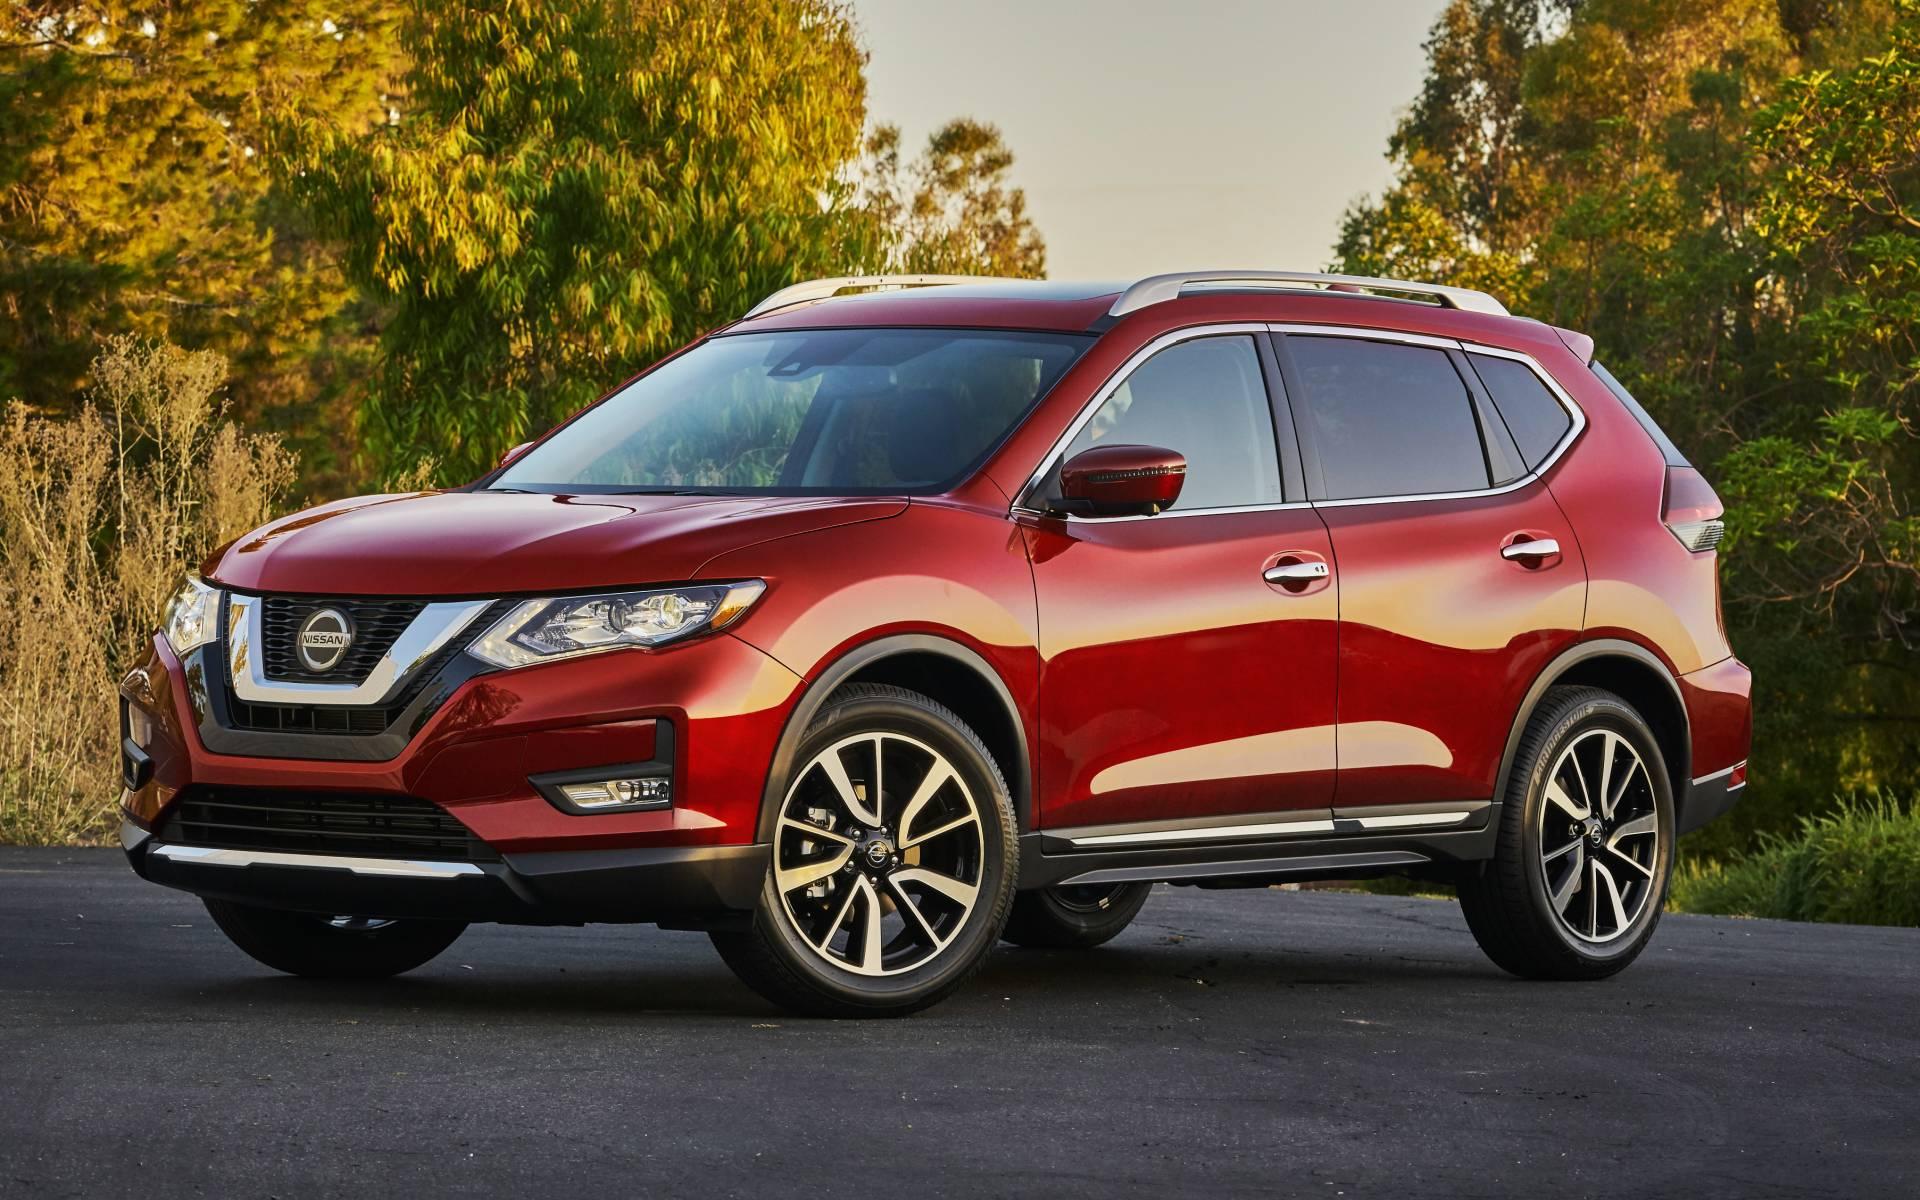 2022 Nissan Rogue Hybrid Manual 2013 Prices Trim Levels App